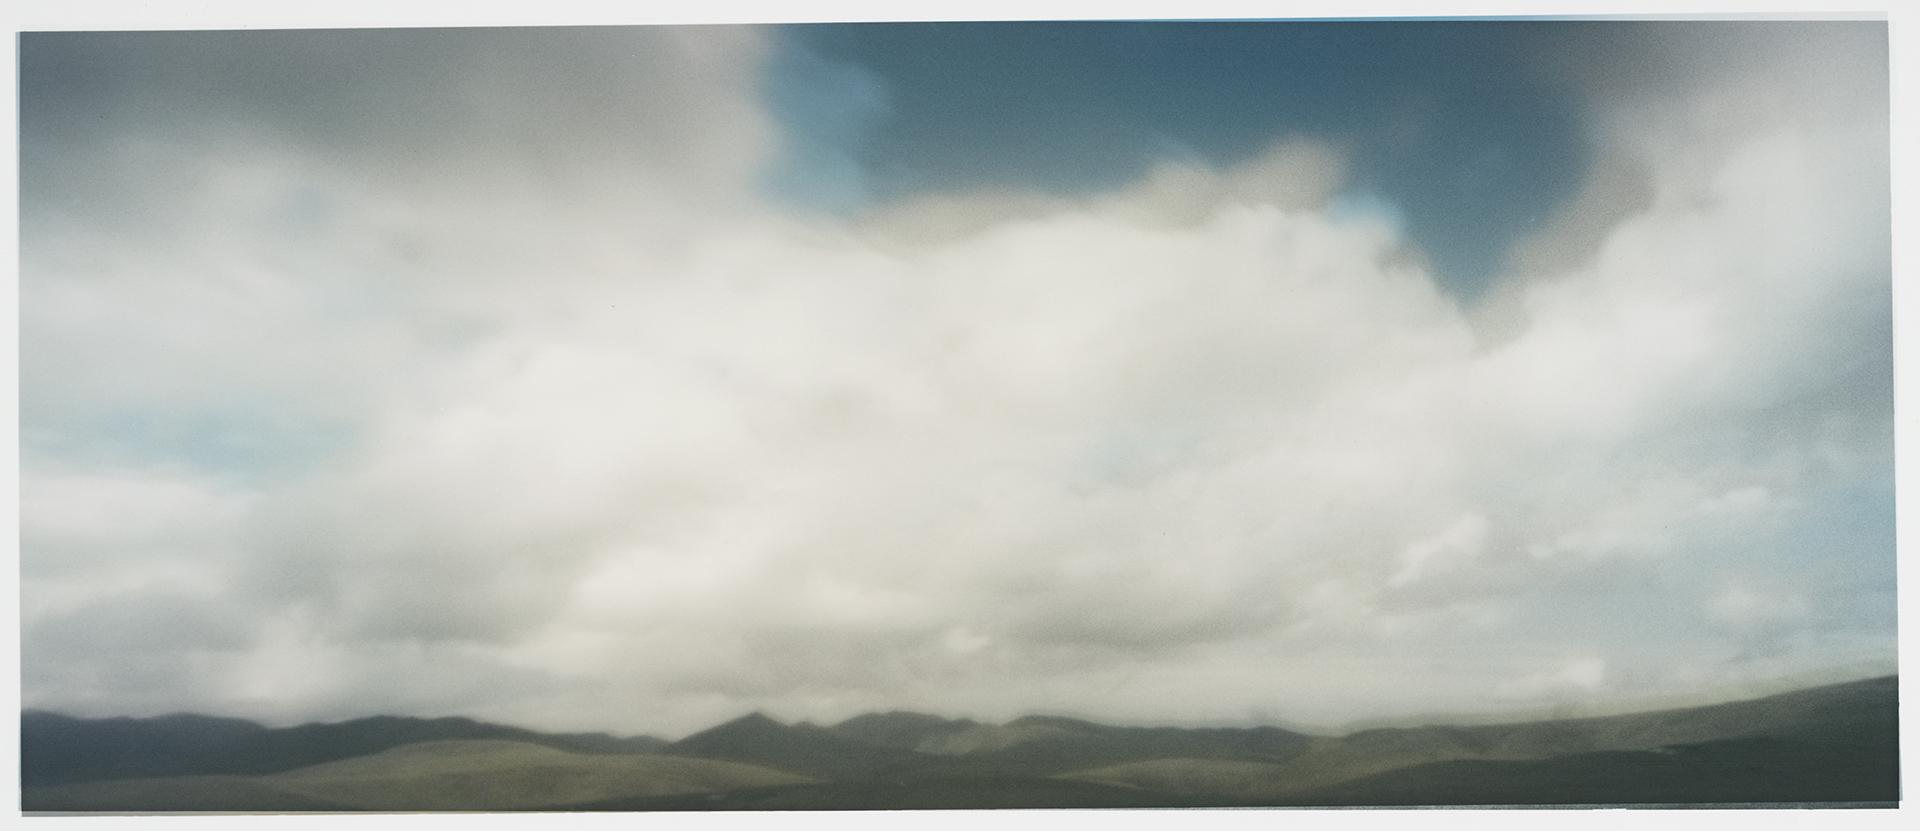 E.T. 14.35-14.55. East Tibet, 2016